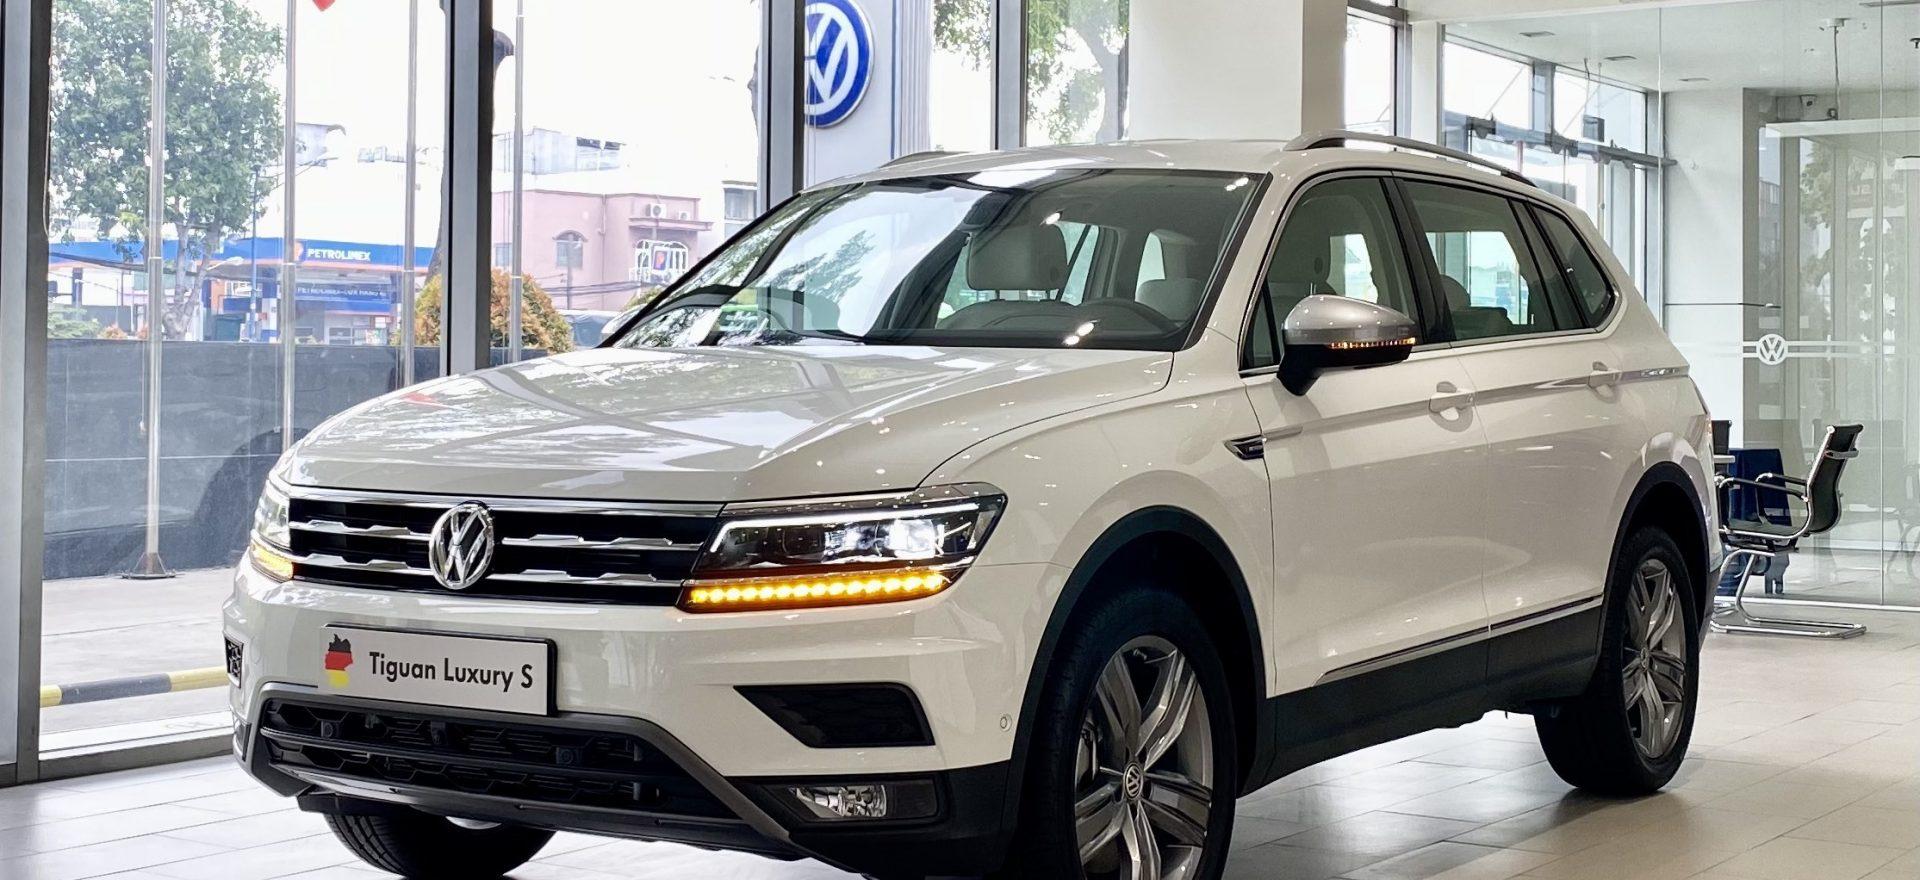 Tiguan luxury s trang  2021 - Volkswagen Sai Gon